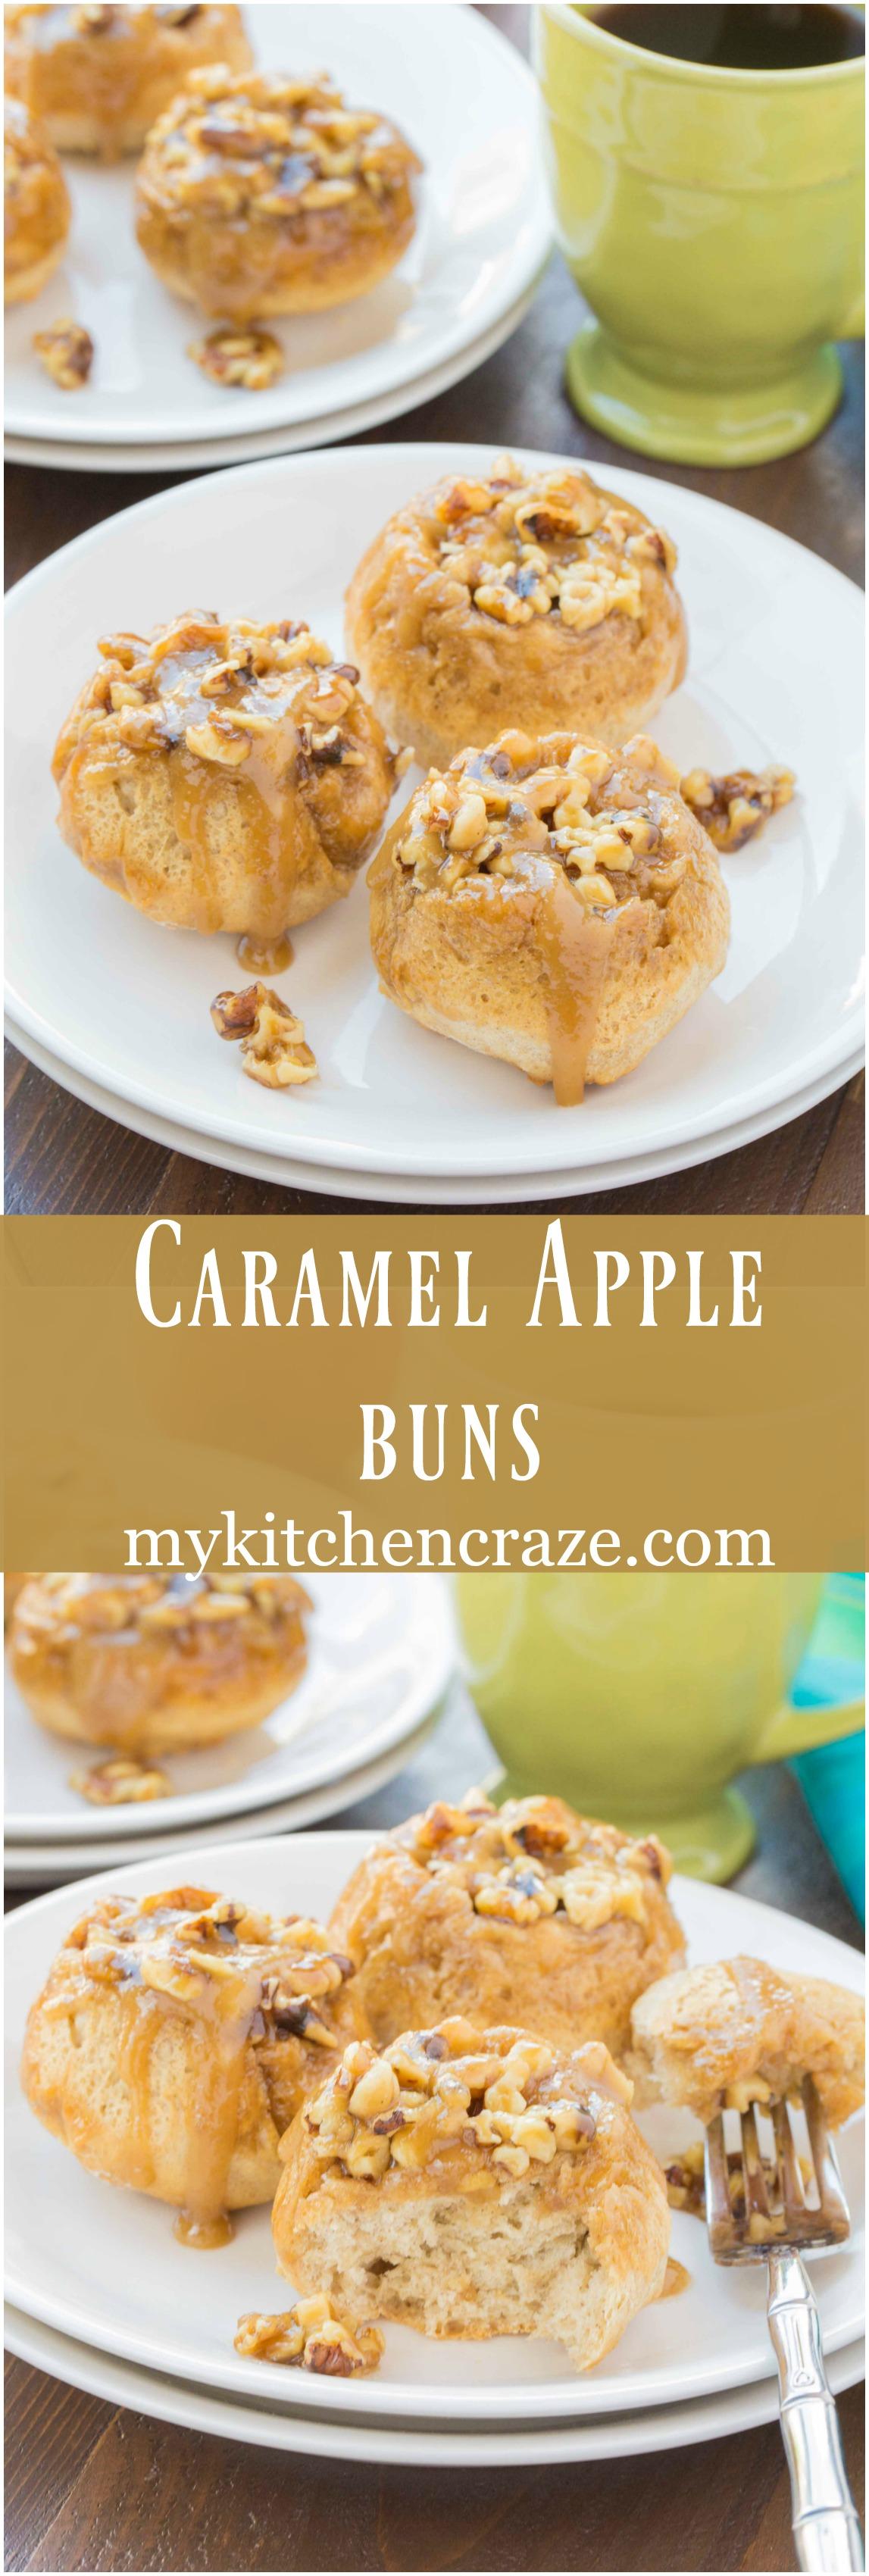 Caramel Apple Buns ~ mykitchencraze.com